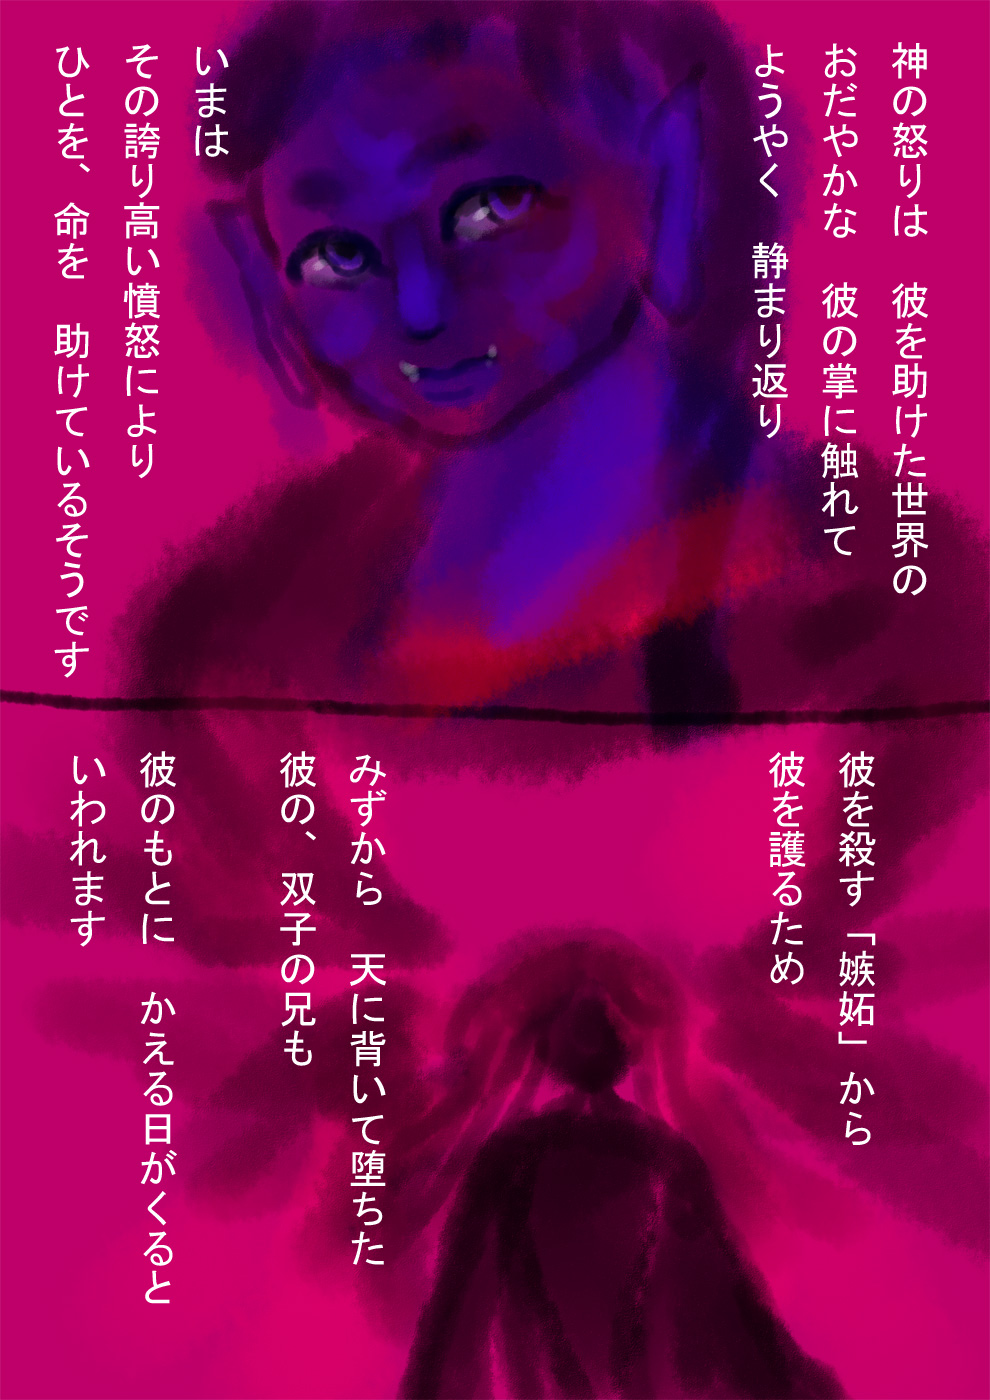 http://ahito.com/comic/ehon/kamiuta/img/2018/20180315/06.jpg